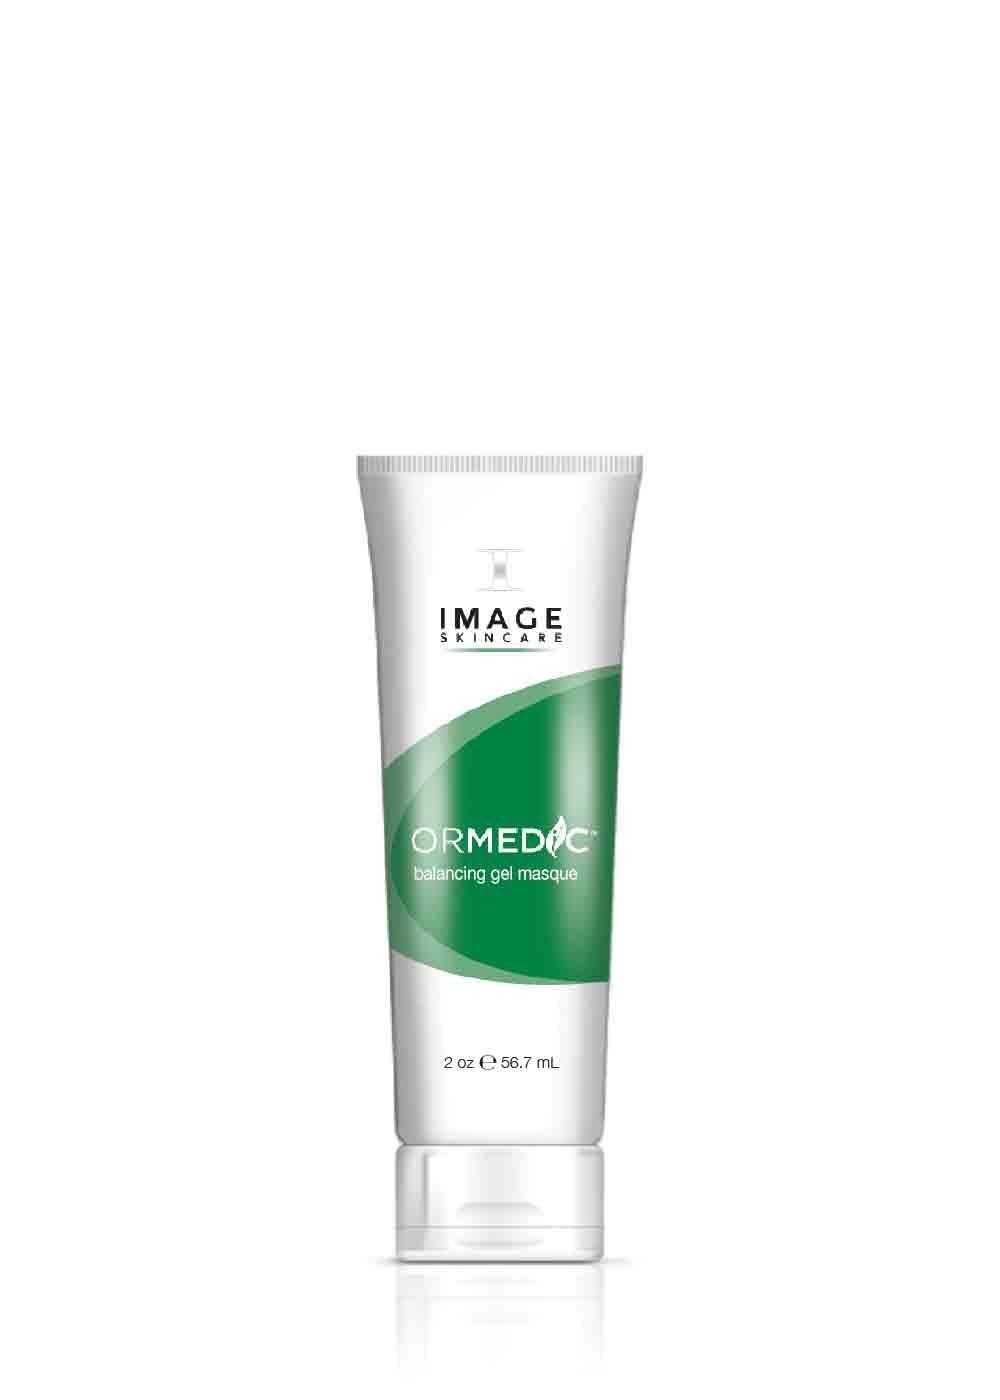 ORMEDIC    balancing gel masque masque gel équilibrant